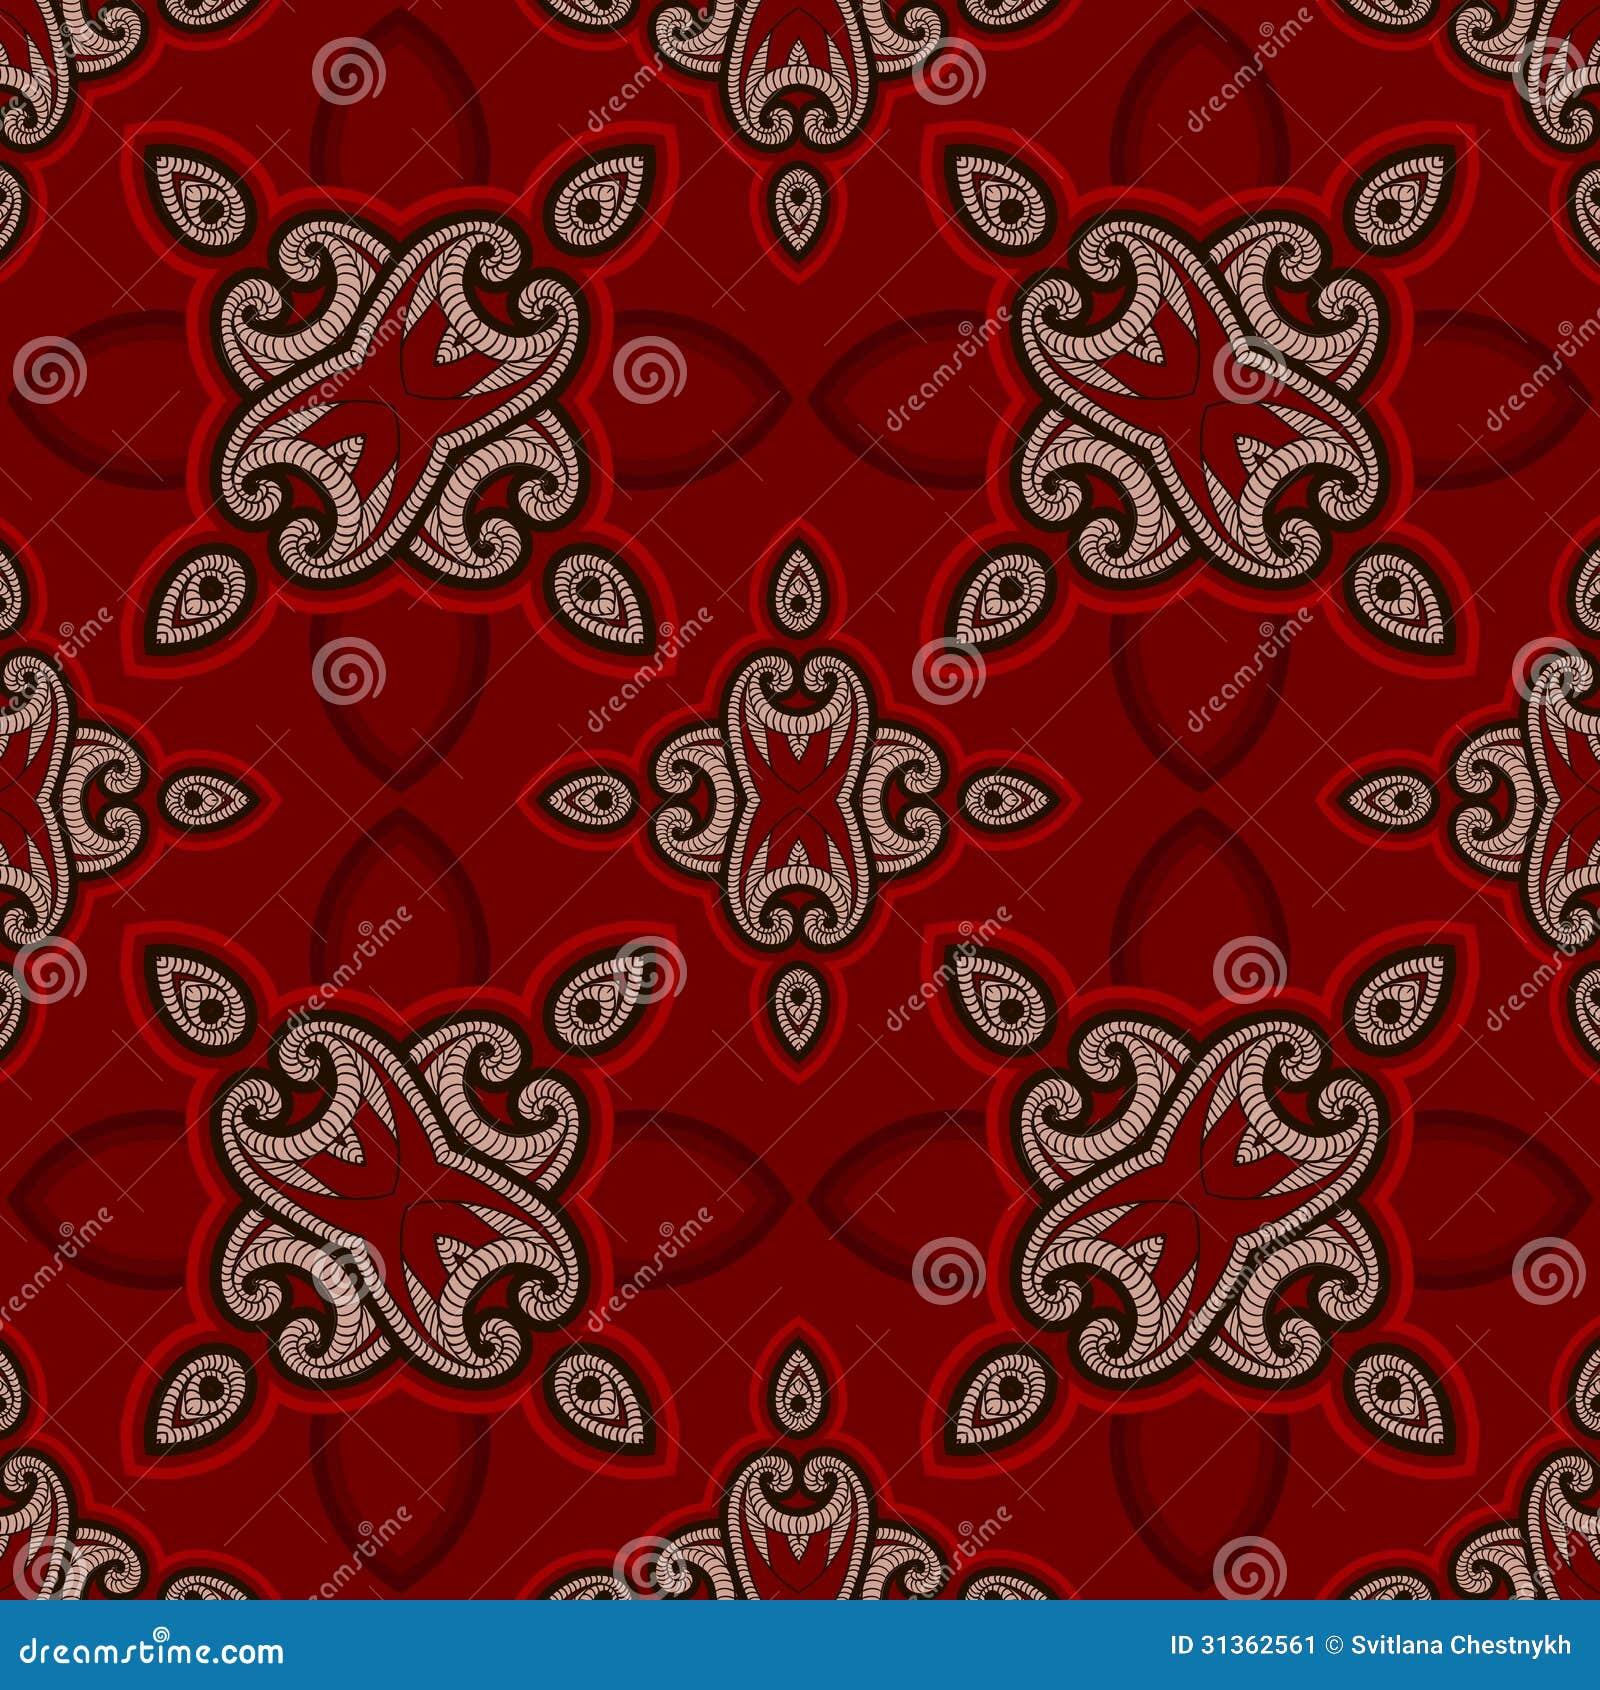 Fabulous Red Floor Tile Pics Inspirations – Dievoon